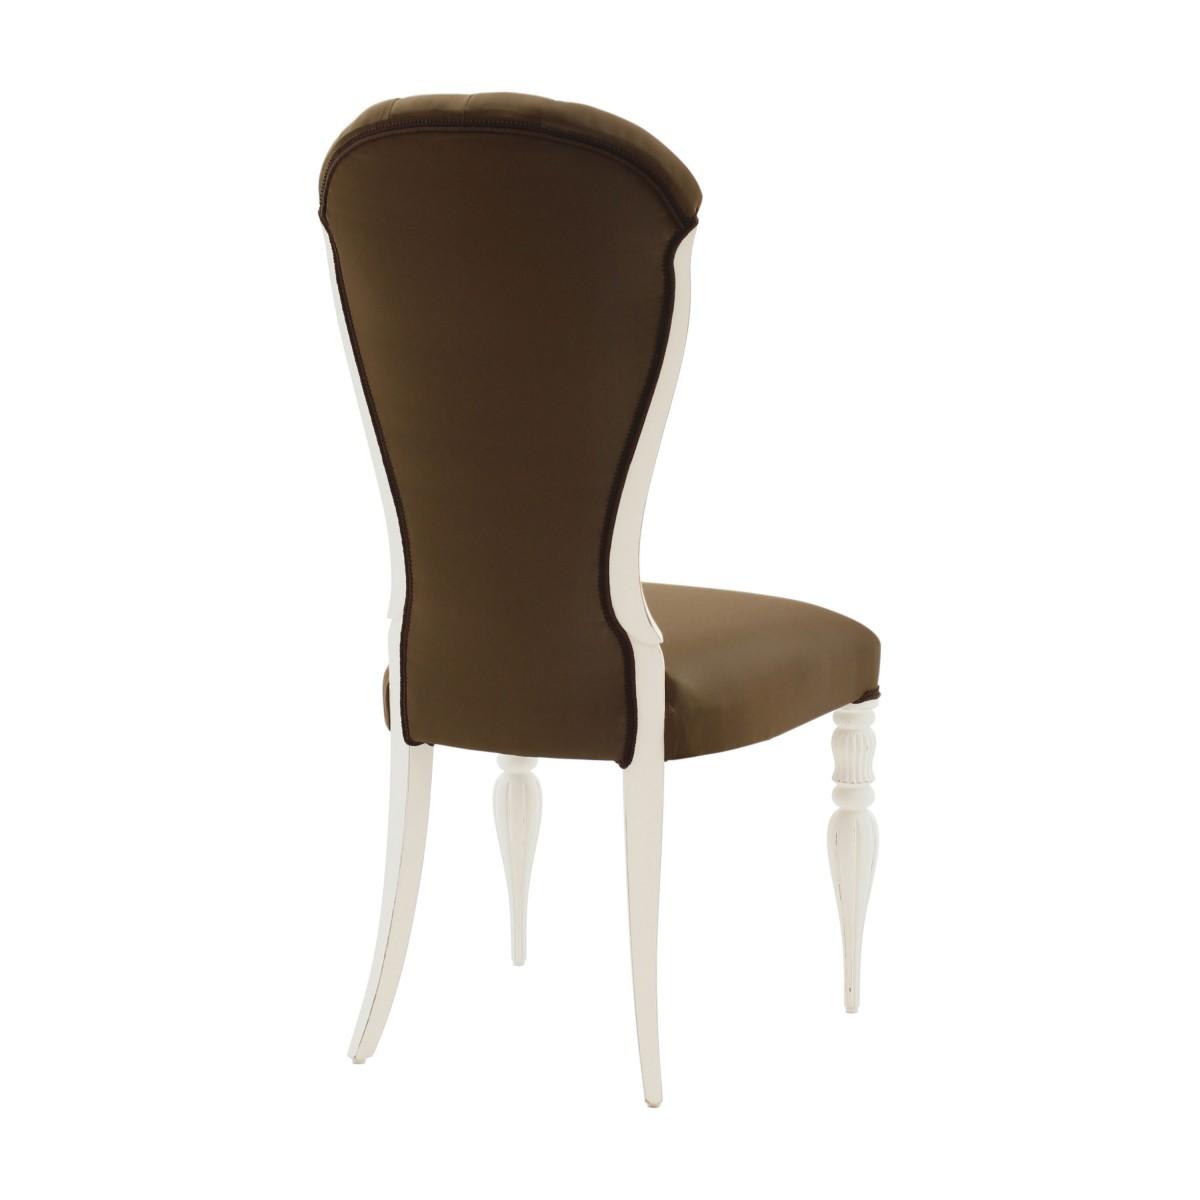 italian chair adele 1 8210